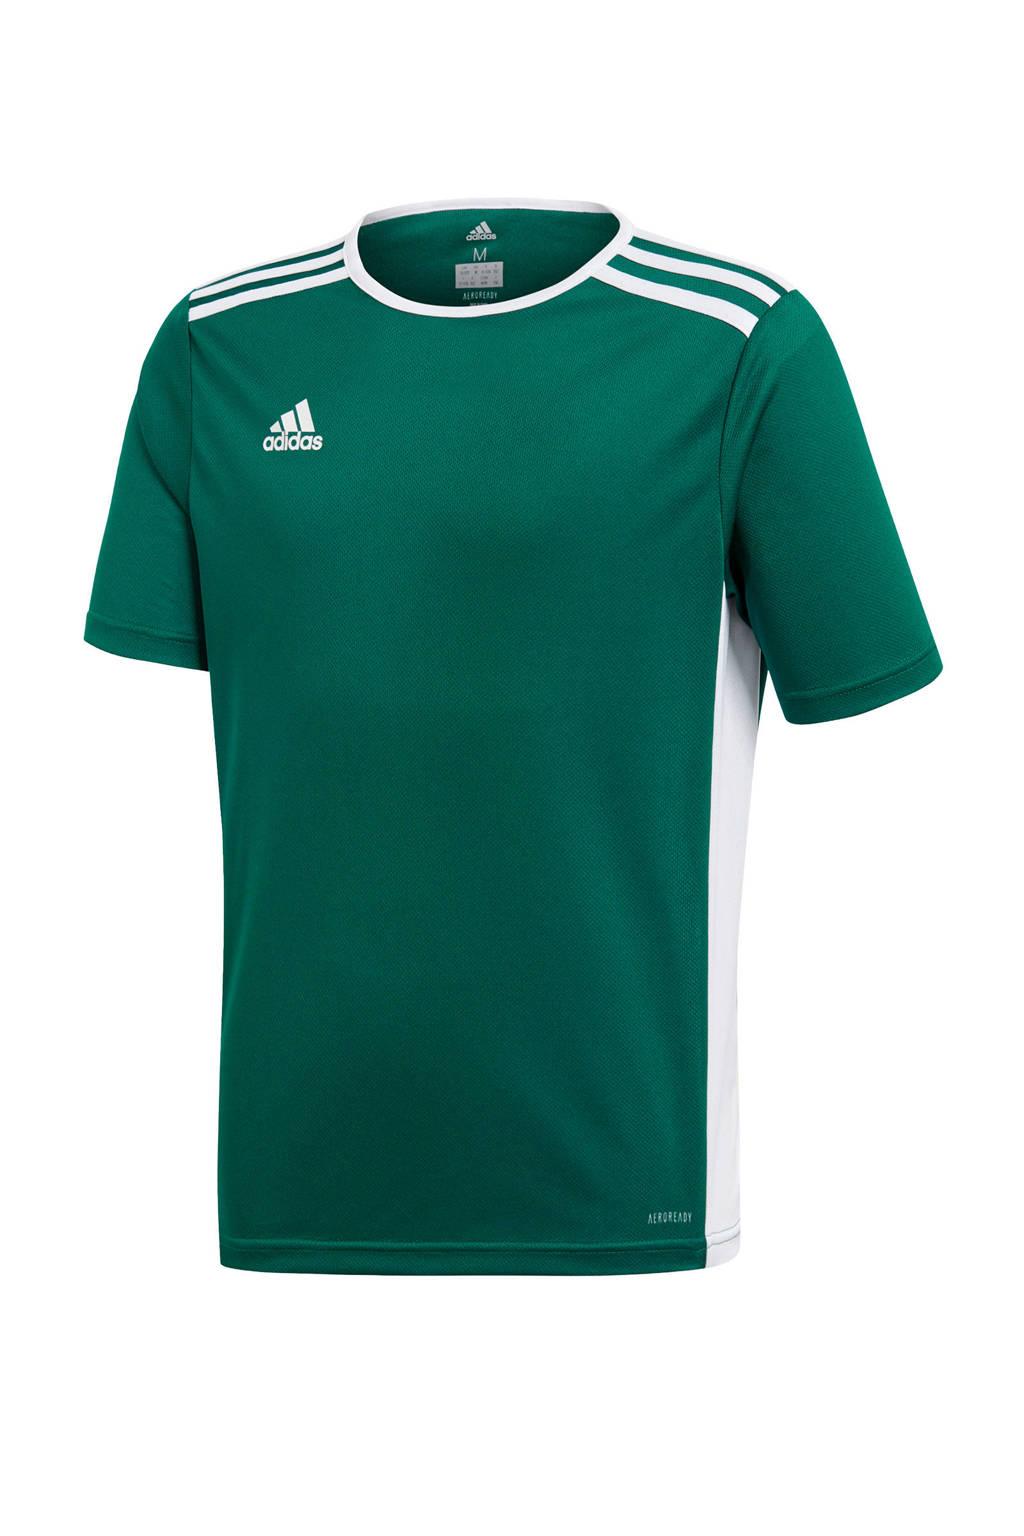 adidas Performance Junior  voetbalshirt groen, Groen